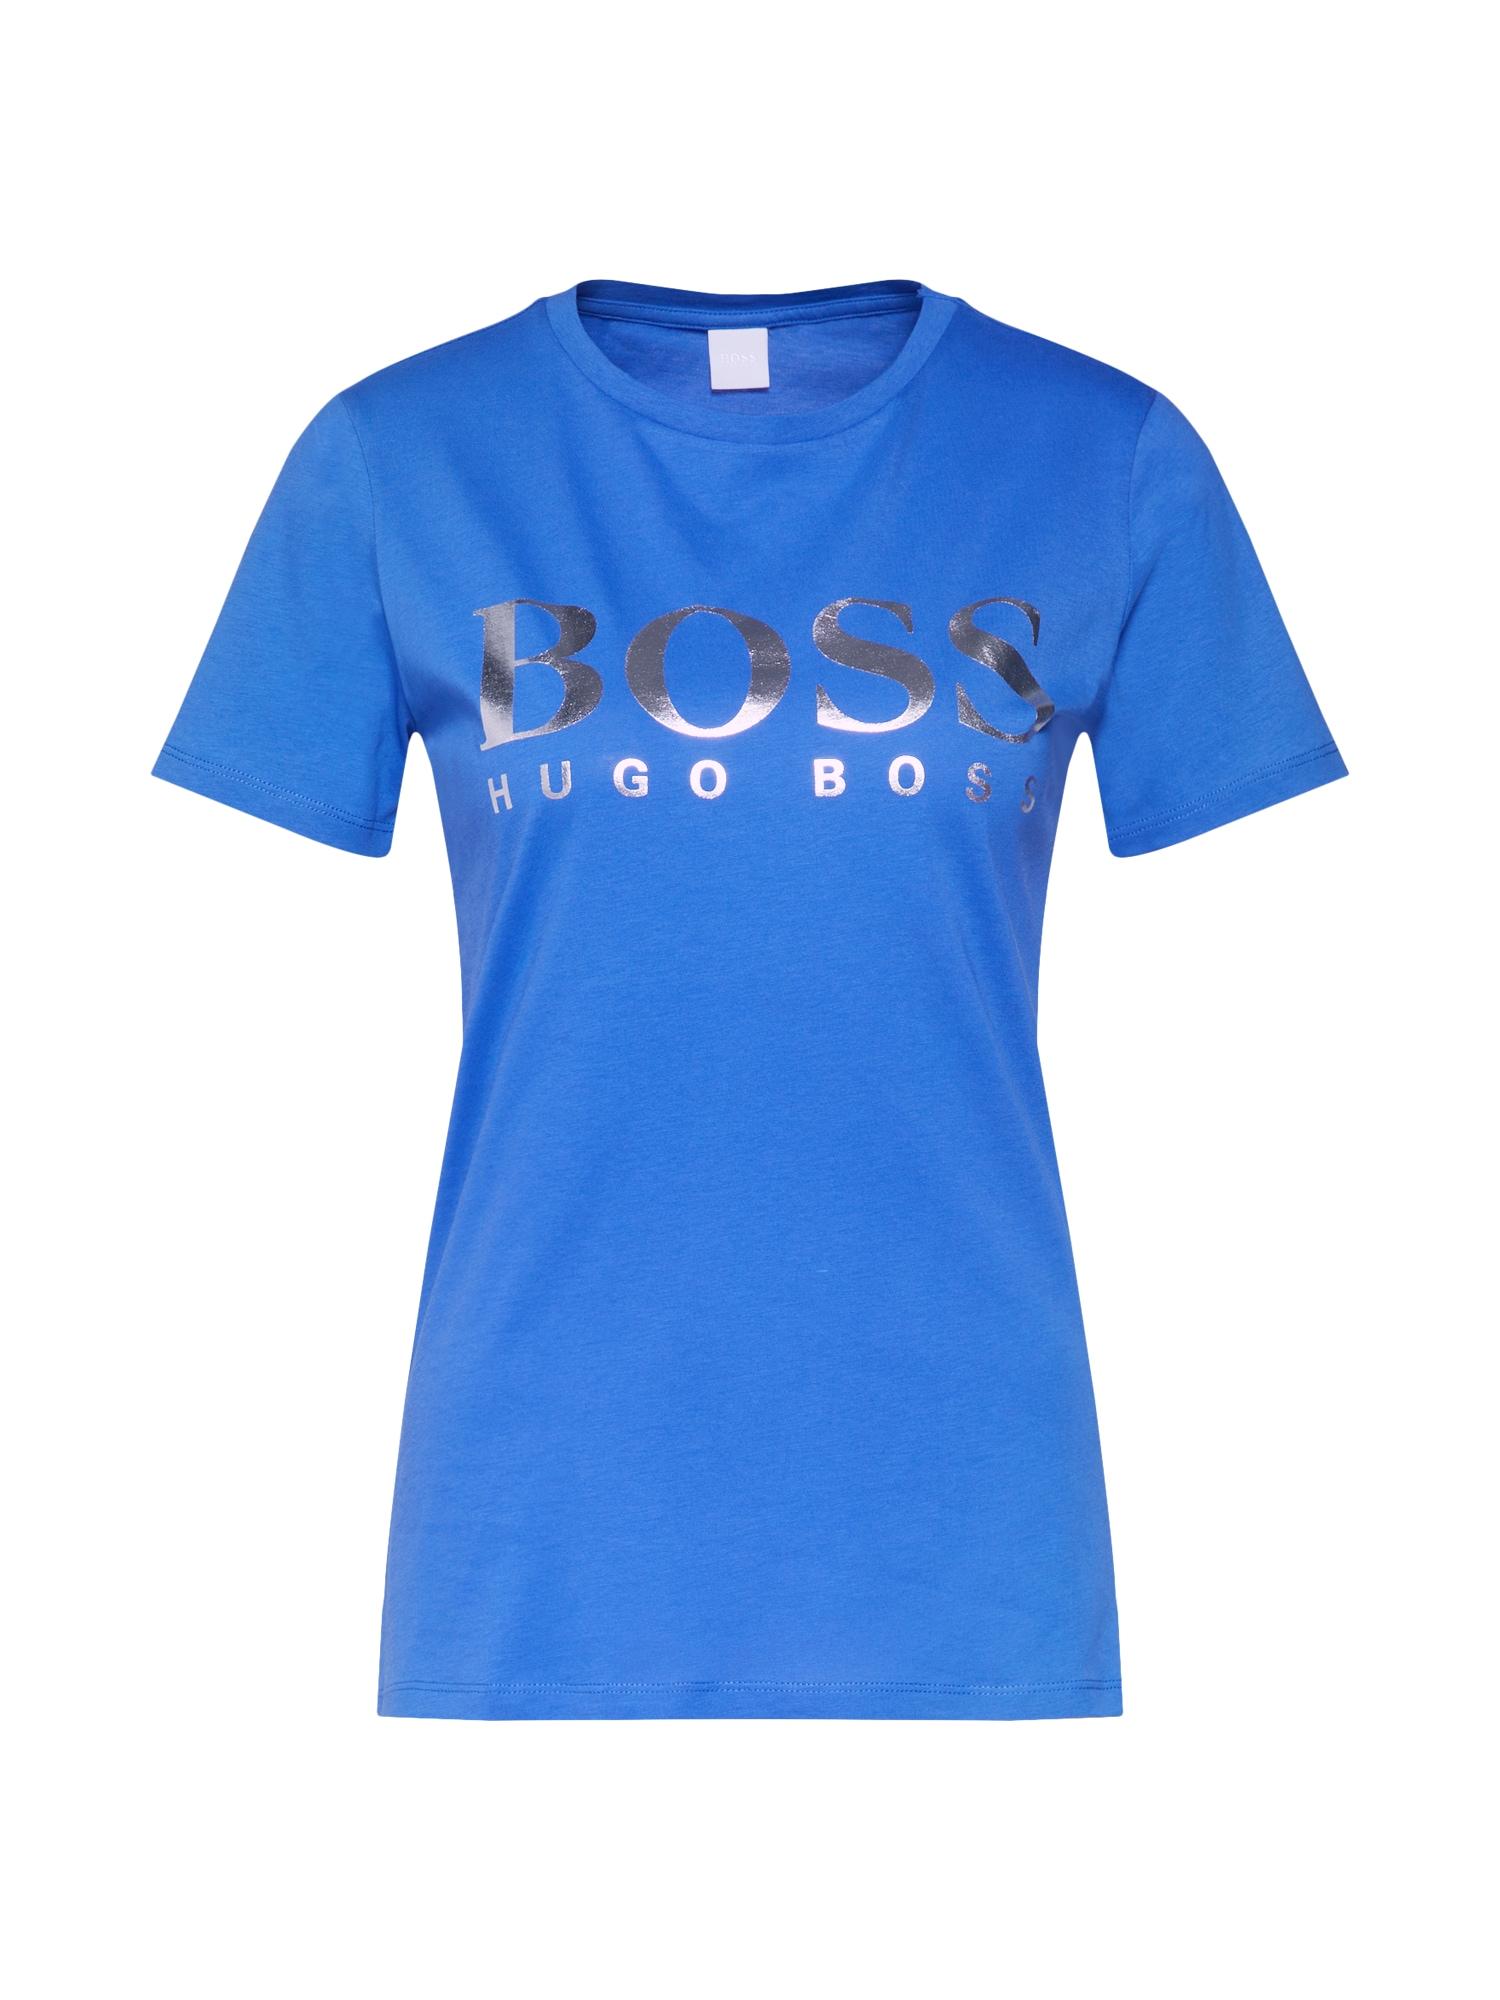 Tričko Teglamour modrá BOSS